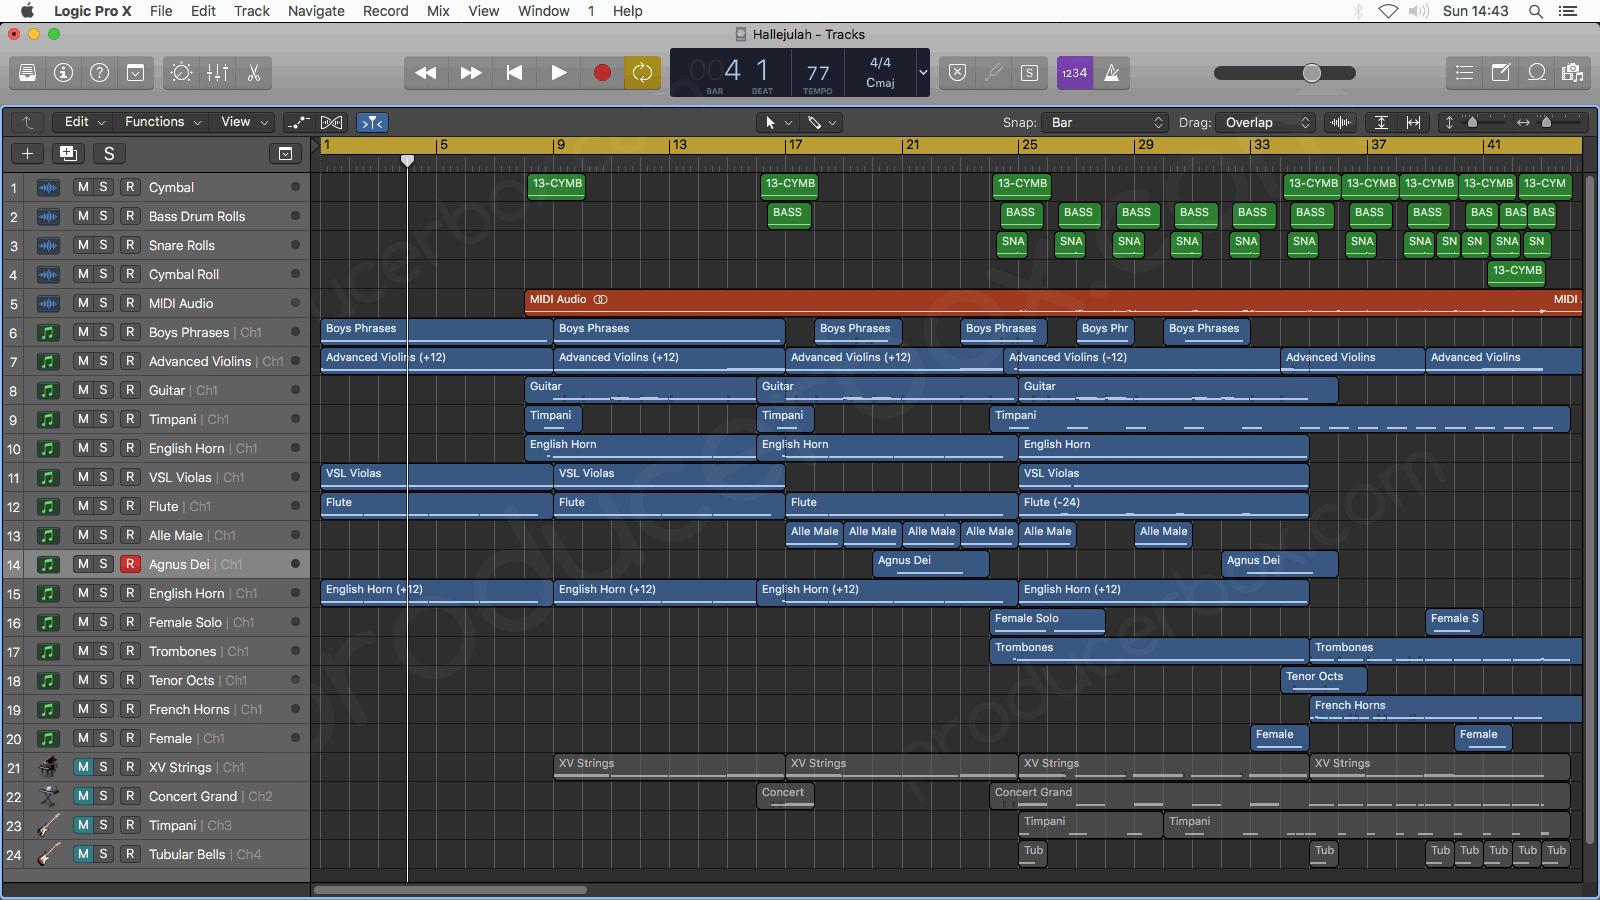 Logic Pro Arrangement Window Screenshot